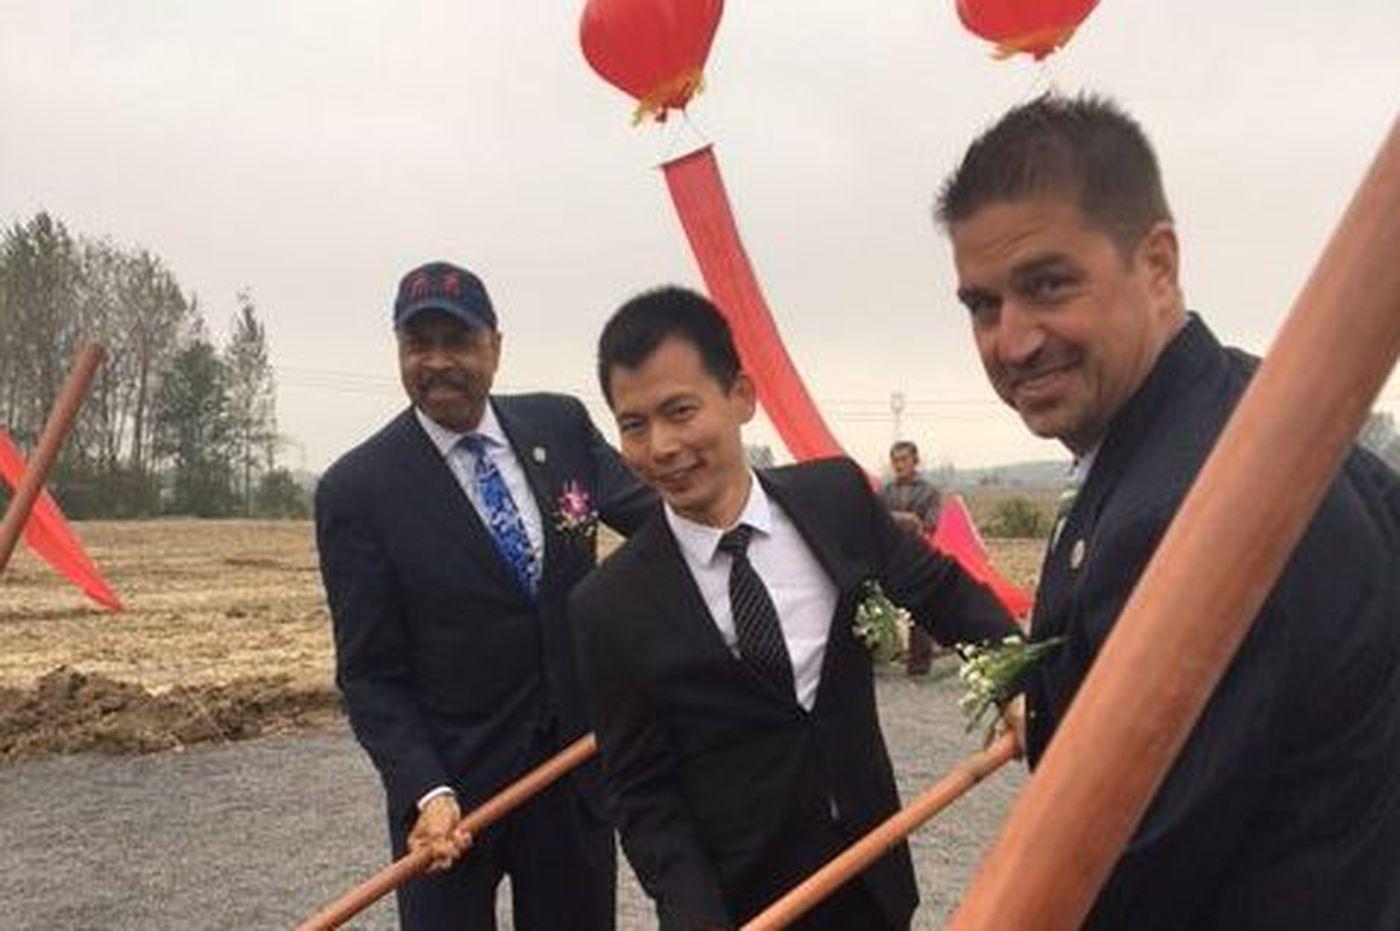 Kennett mushroom grower opens China plant. Is Africa next?